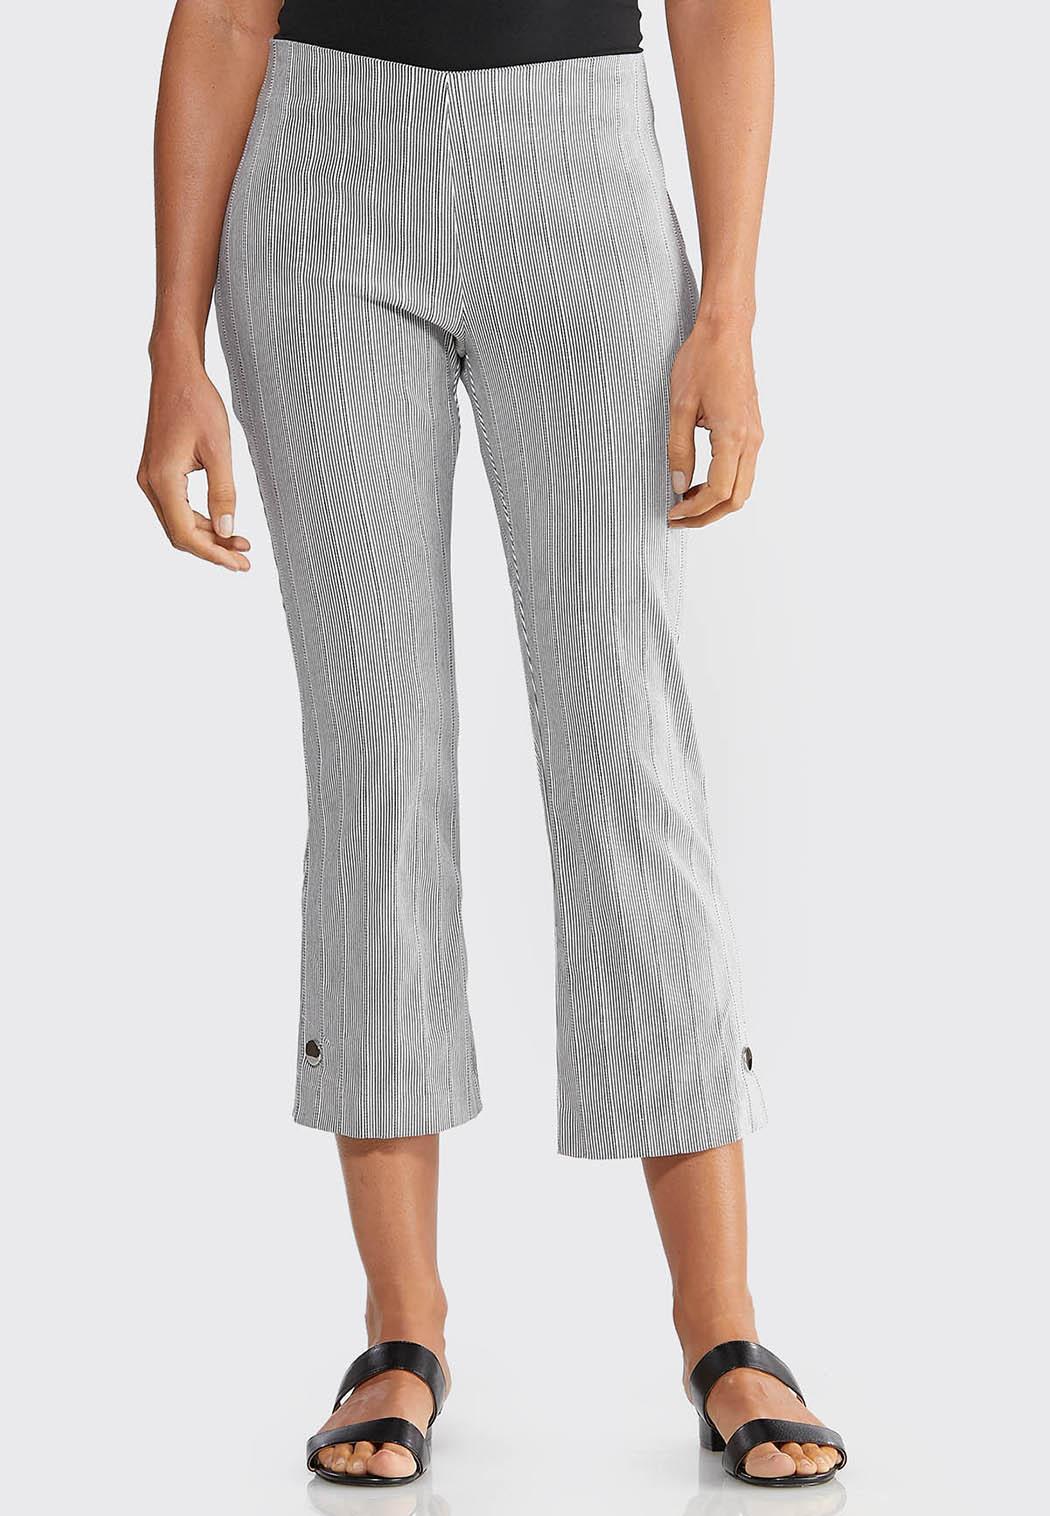 f218499dfa1351 Women's Pants - Palazzo Pants, Slim Leg, Skinny Leg Pants, Leggings & More